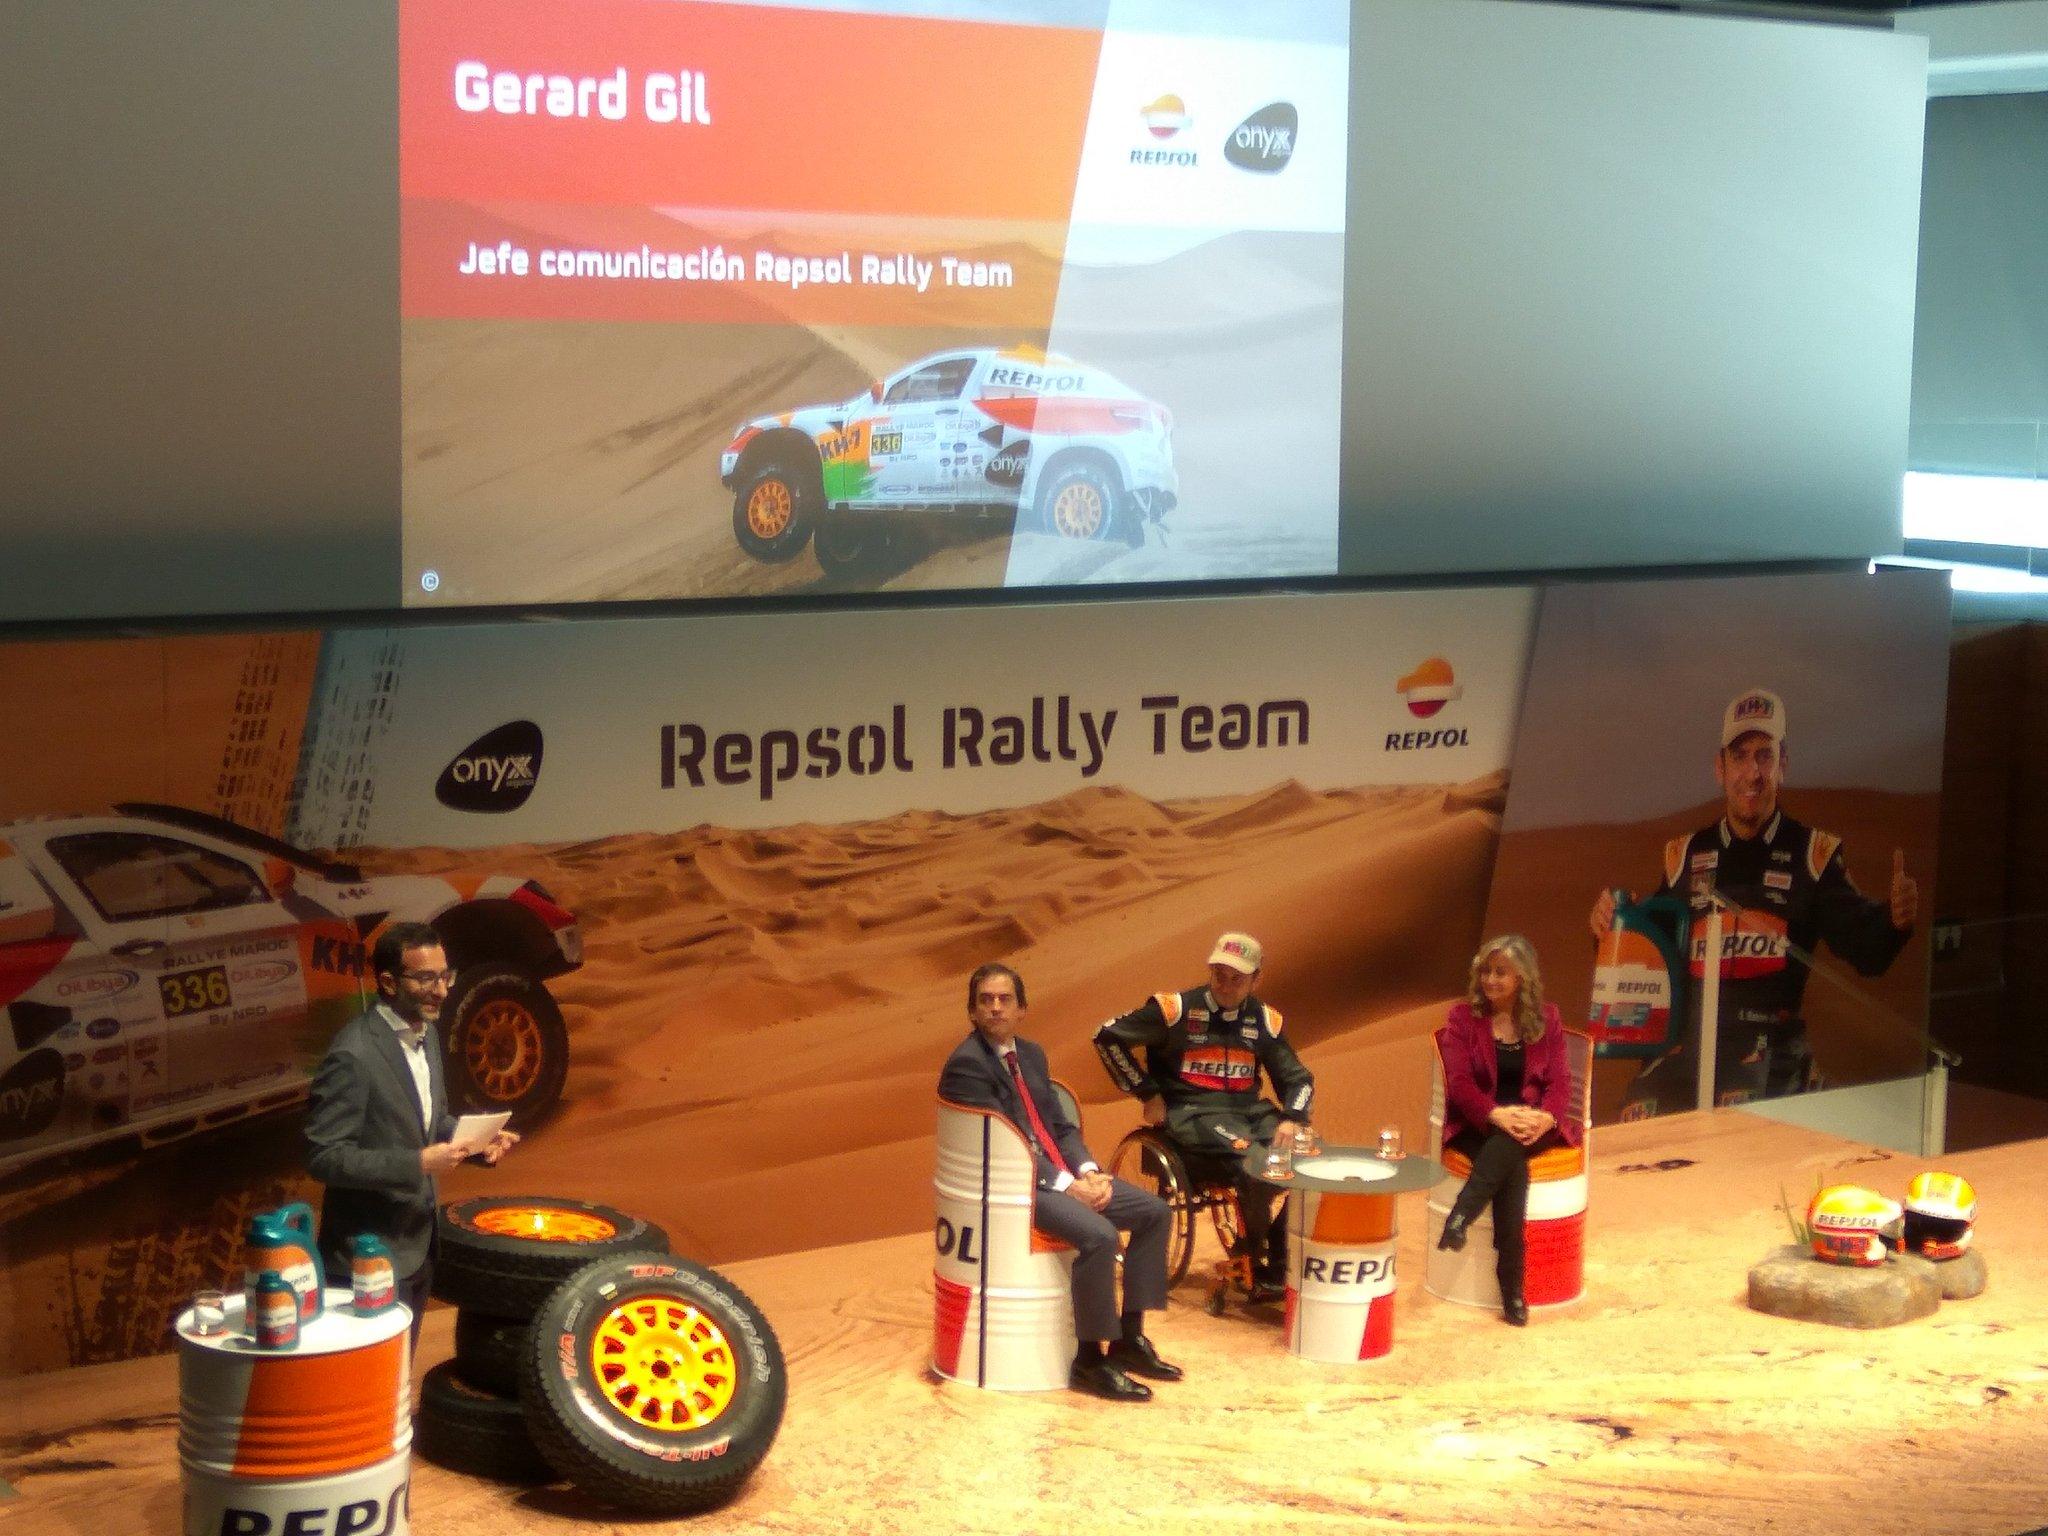 2018 40º Rallye Raid Dakar Perú - Bolivia - Argentina [6-20 Enero] - Página 2 DQ1y8XzXUAAY4zN